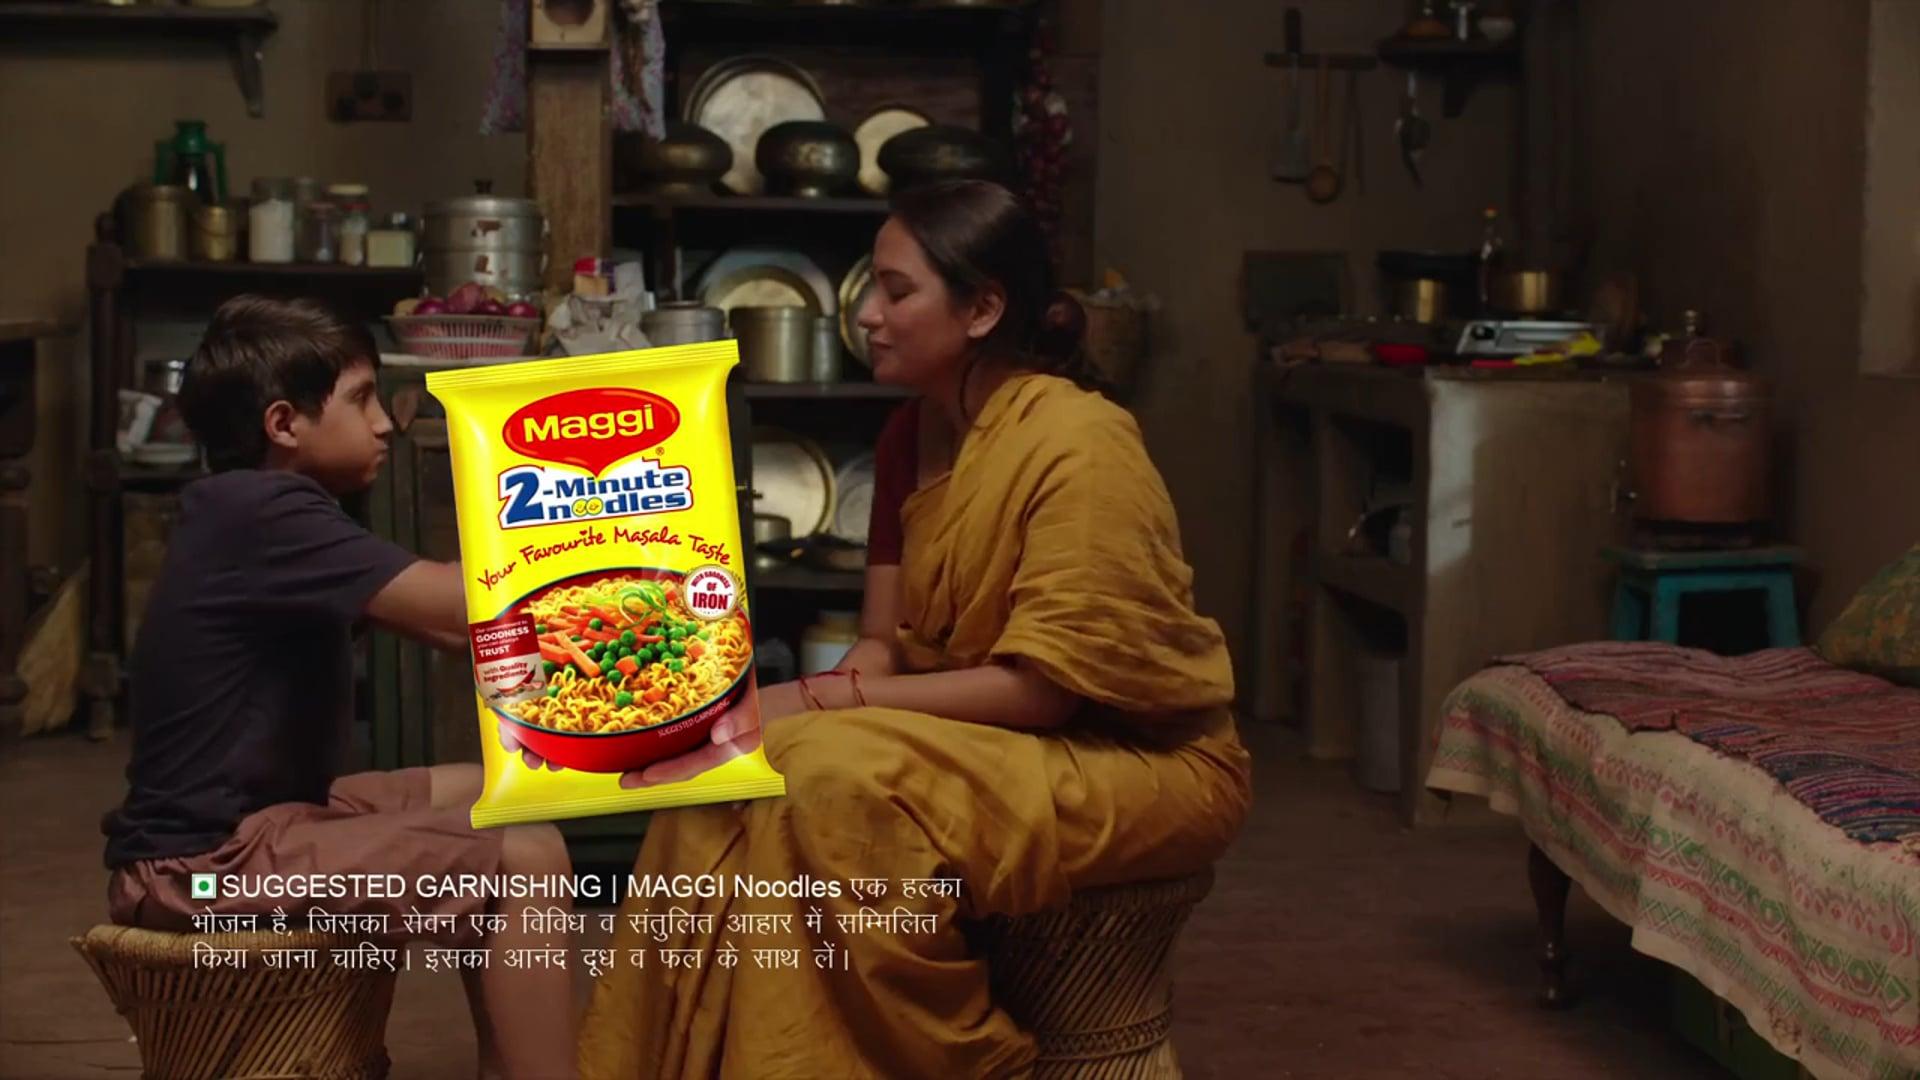 MAGGI Masala Noodles with Goodness of Iron - Food Stylist Nitin Tandon